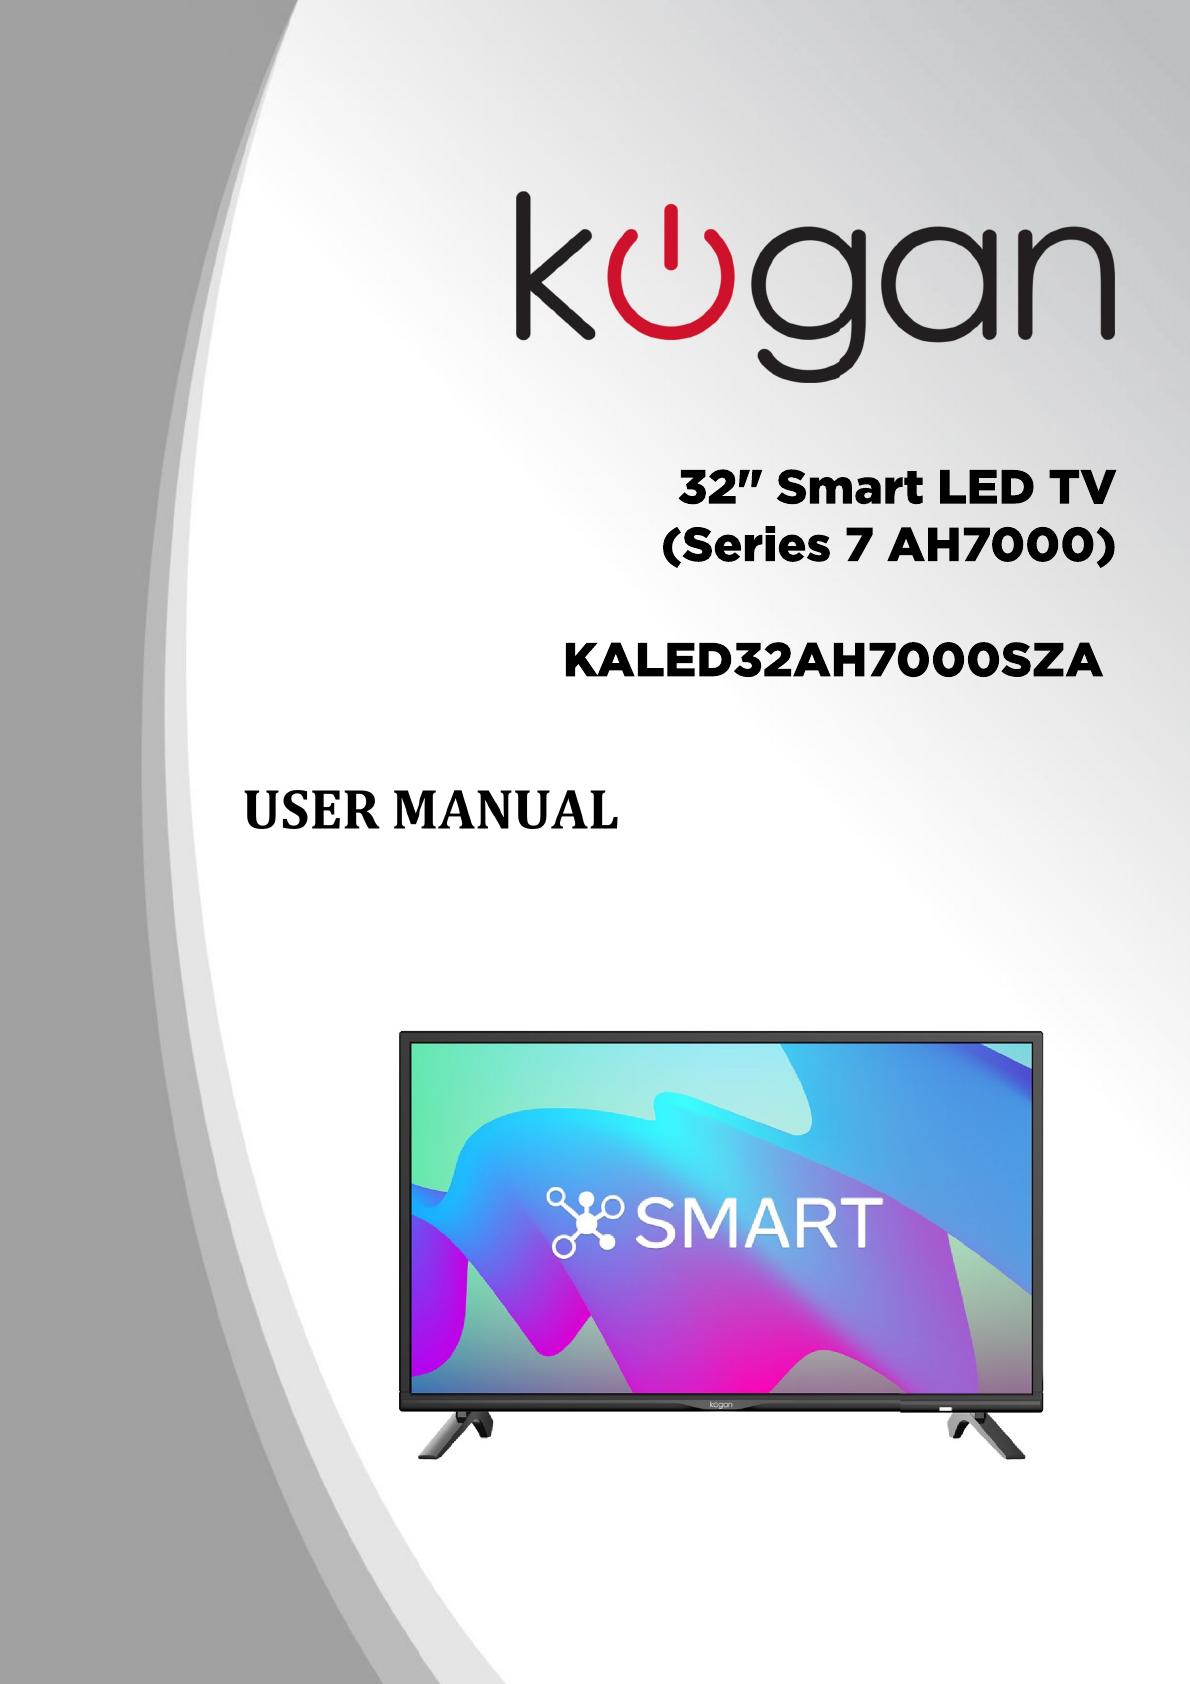 85b88695250 KALED32AH7000SZA Kogan 32 Smart LED TV (Series 7 AH7000) A